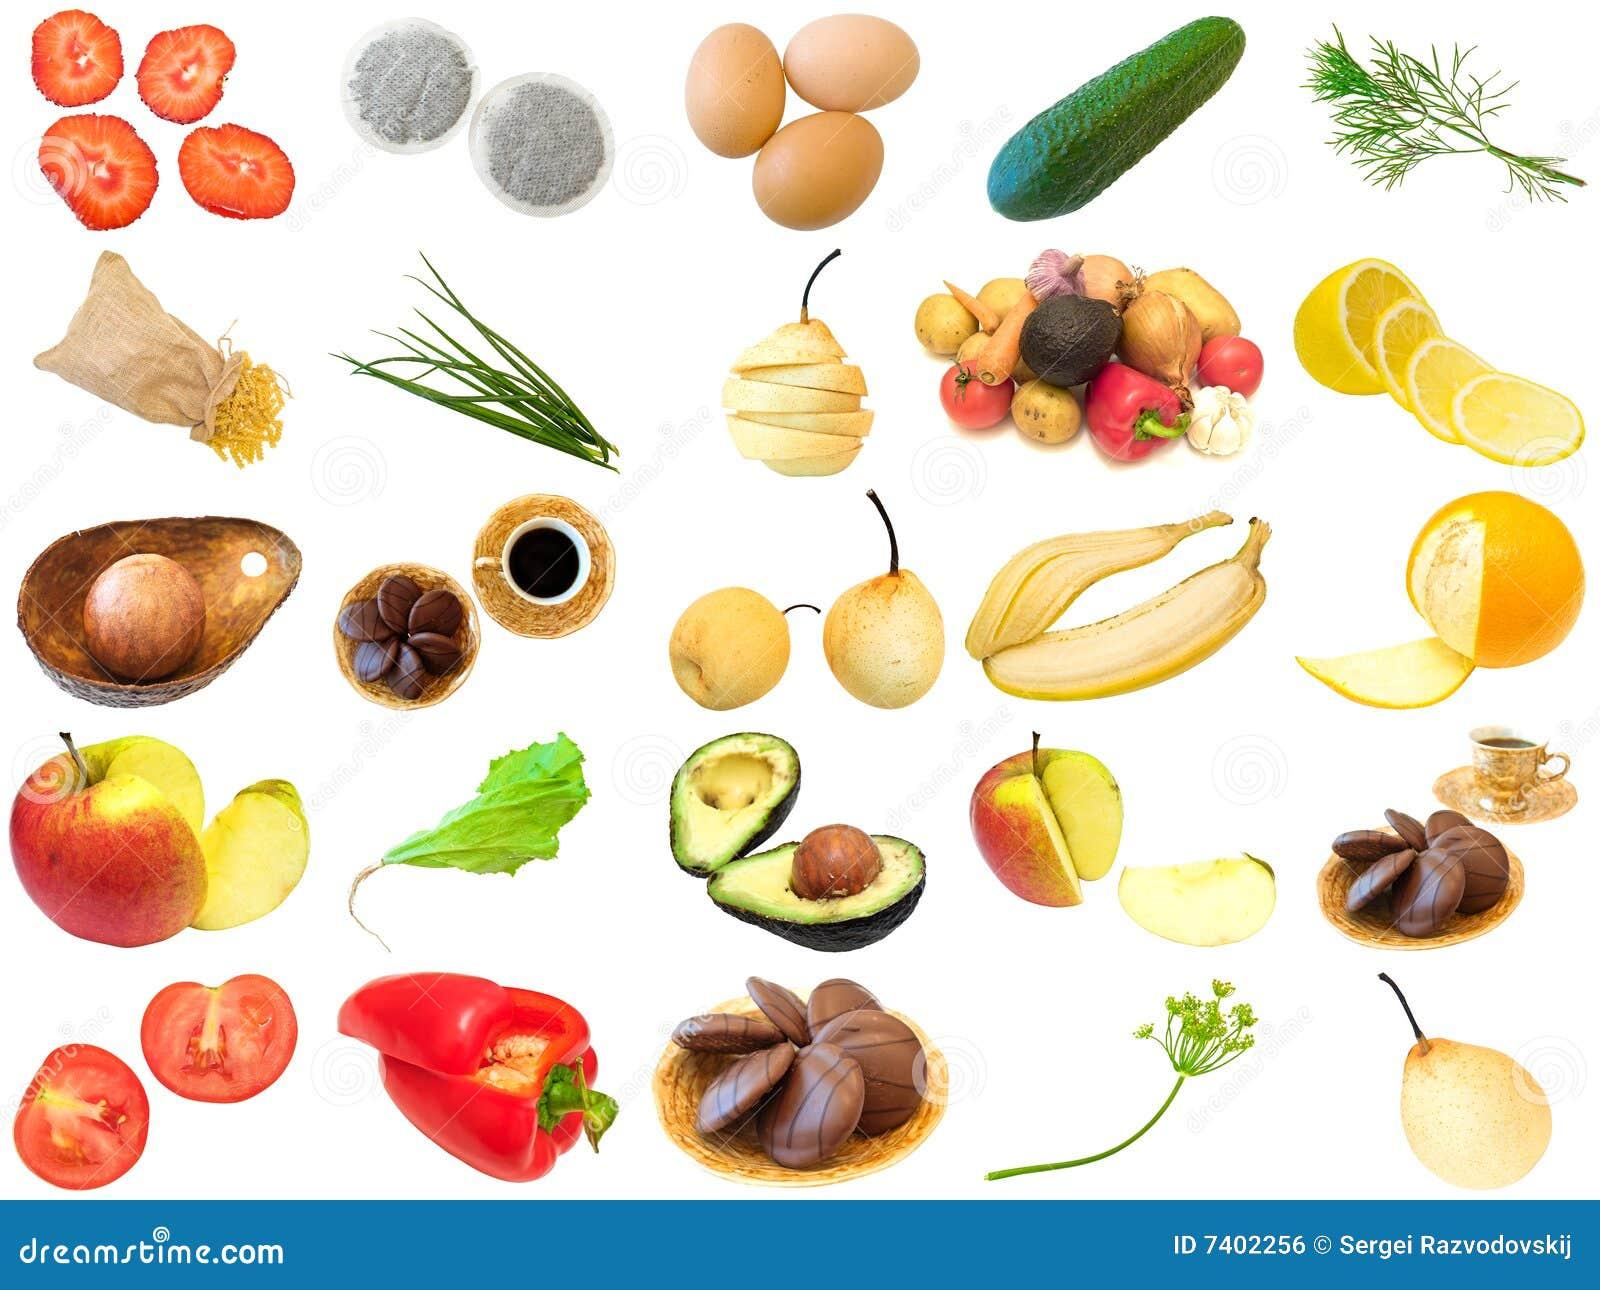 Fije de diversos alimentos imagen de archivo libre de - Fotos de comodas ...